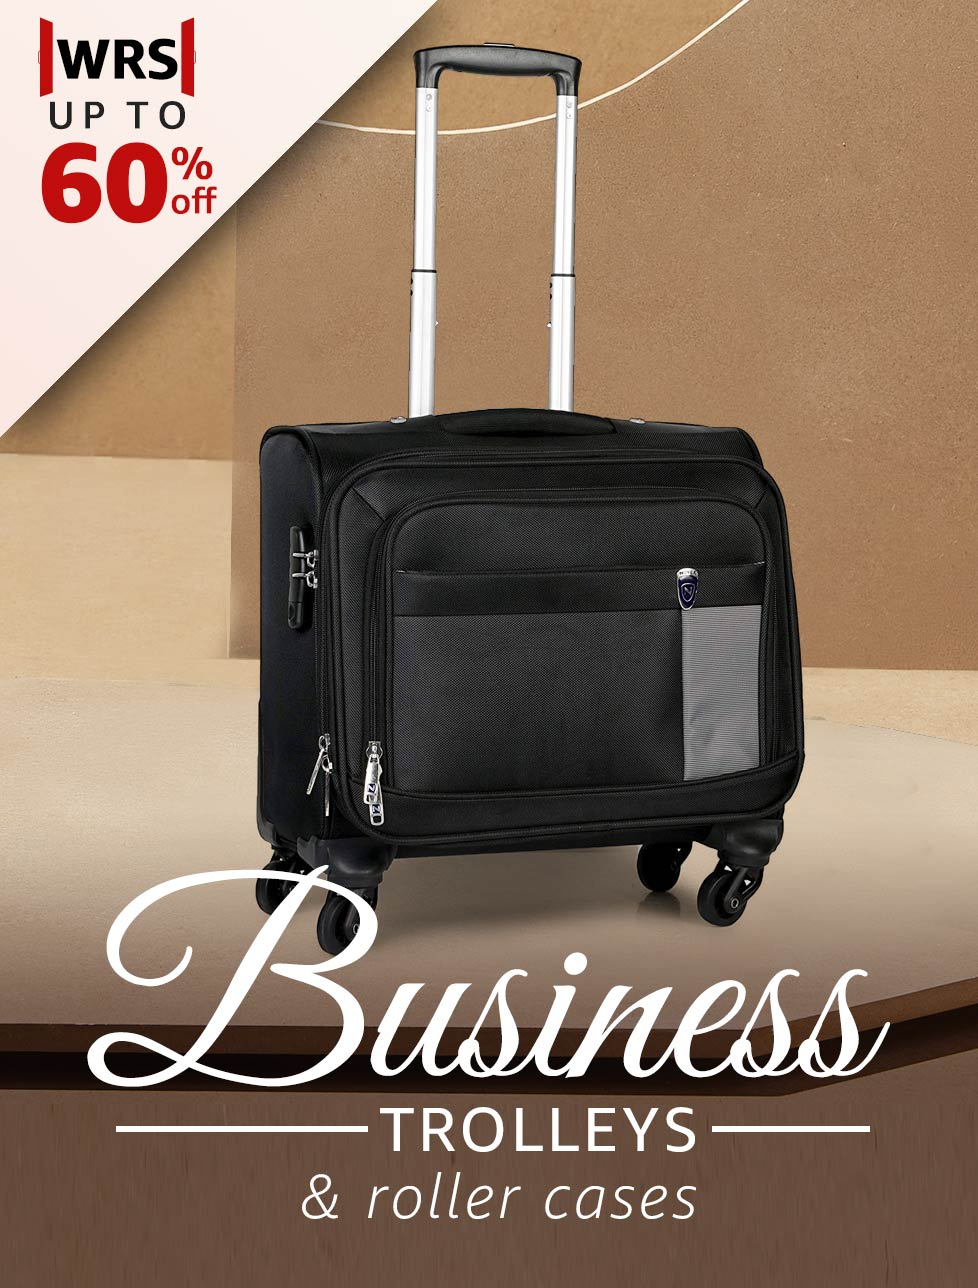 Business trolleys & roller cases